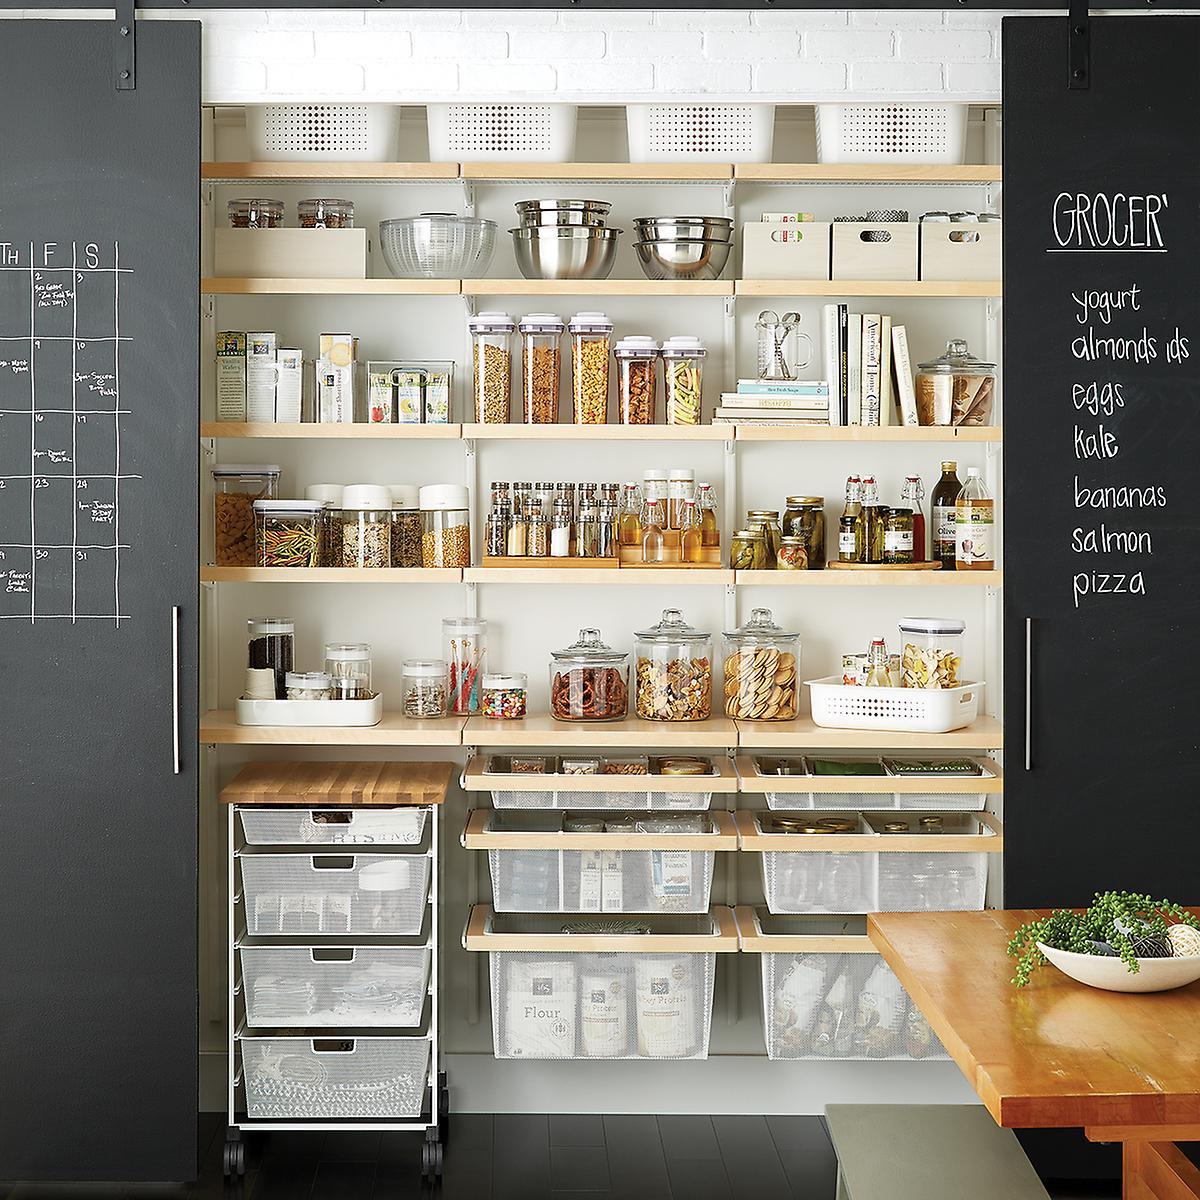 Kitchens Store: White & Birch Elfa Décor Reach-In Pantry